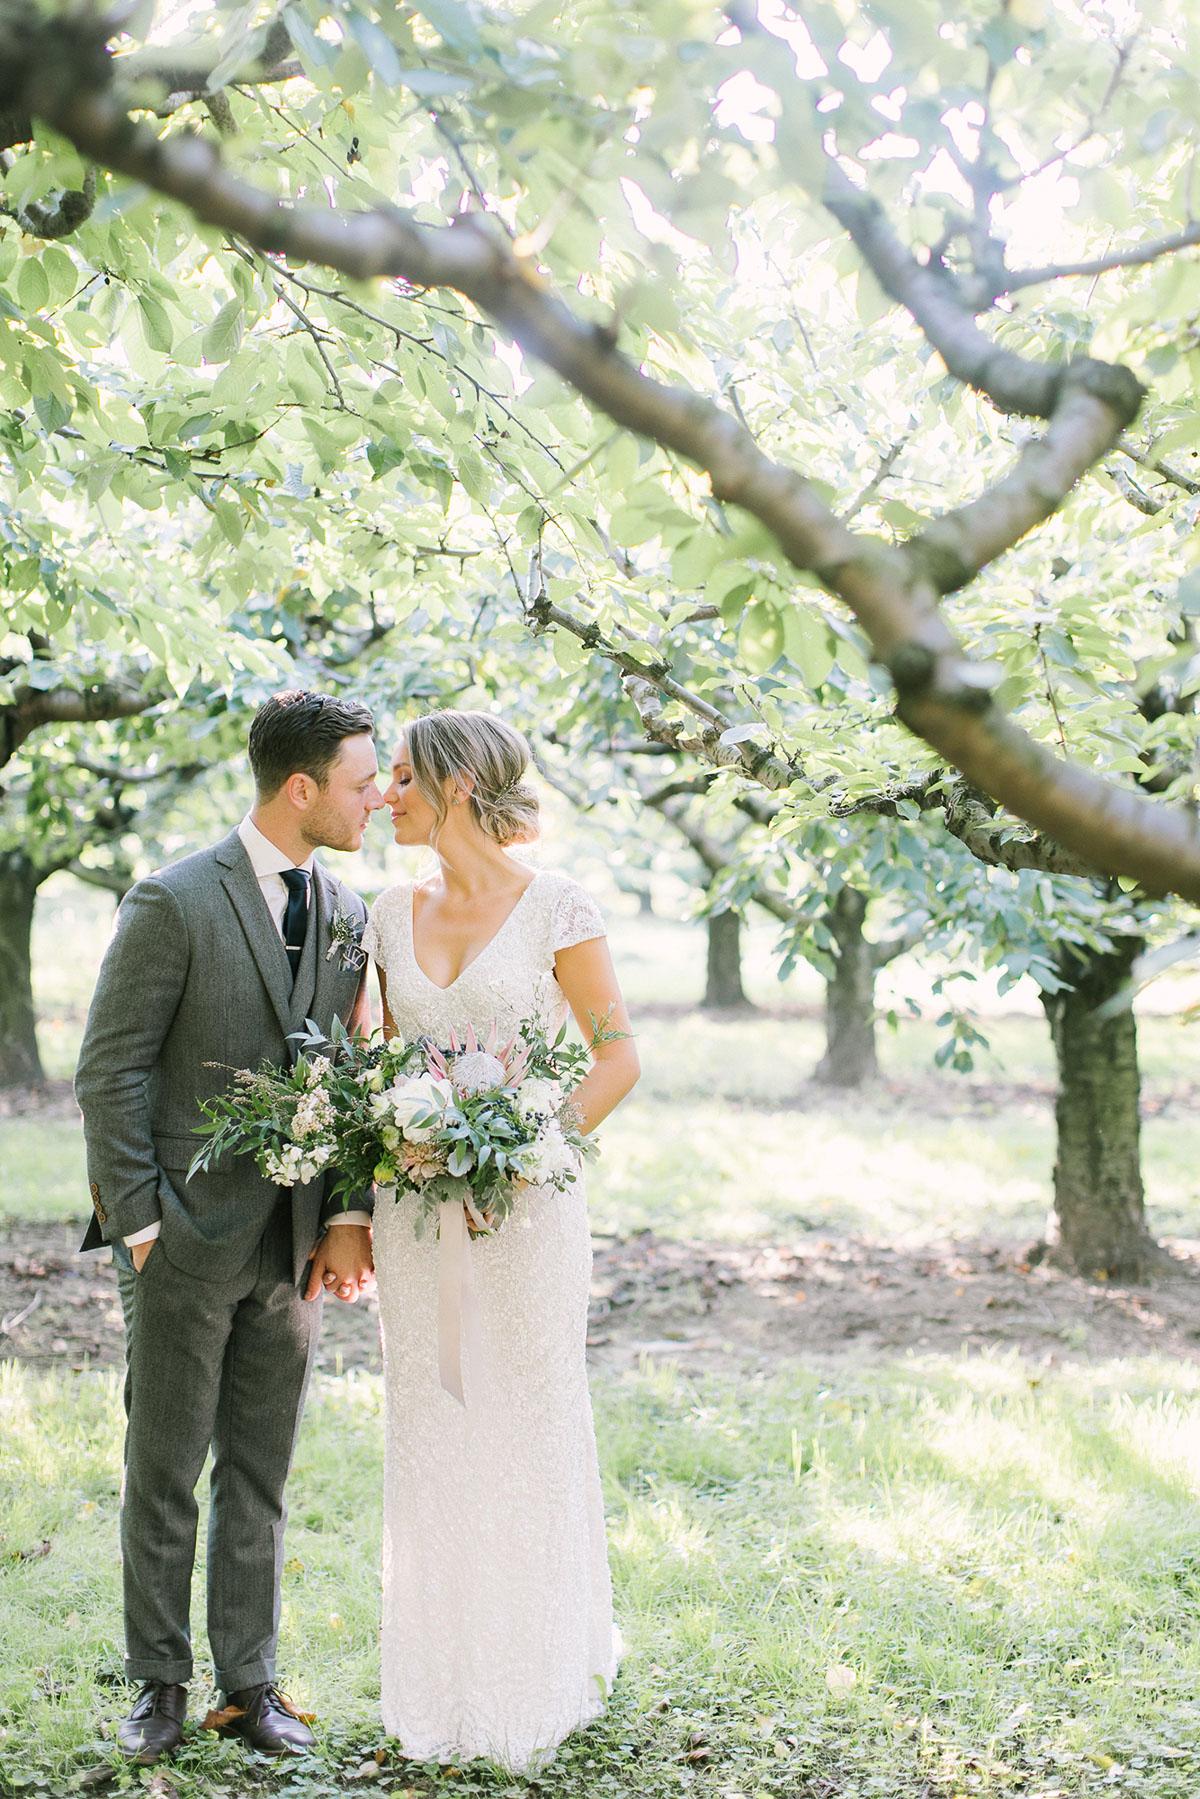 elizabeth-in-love-vineyard-bride-swish-list-cherry-avenue-farms-vineland-wedding-38.jpg